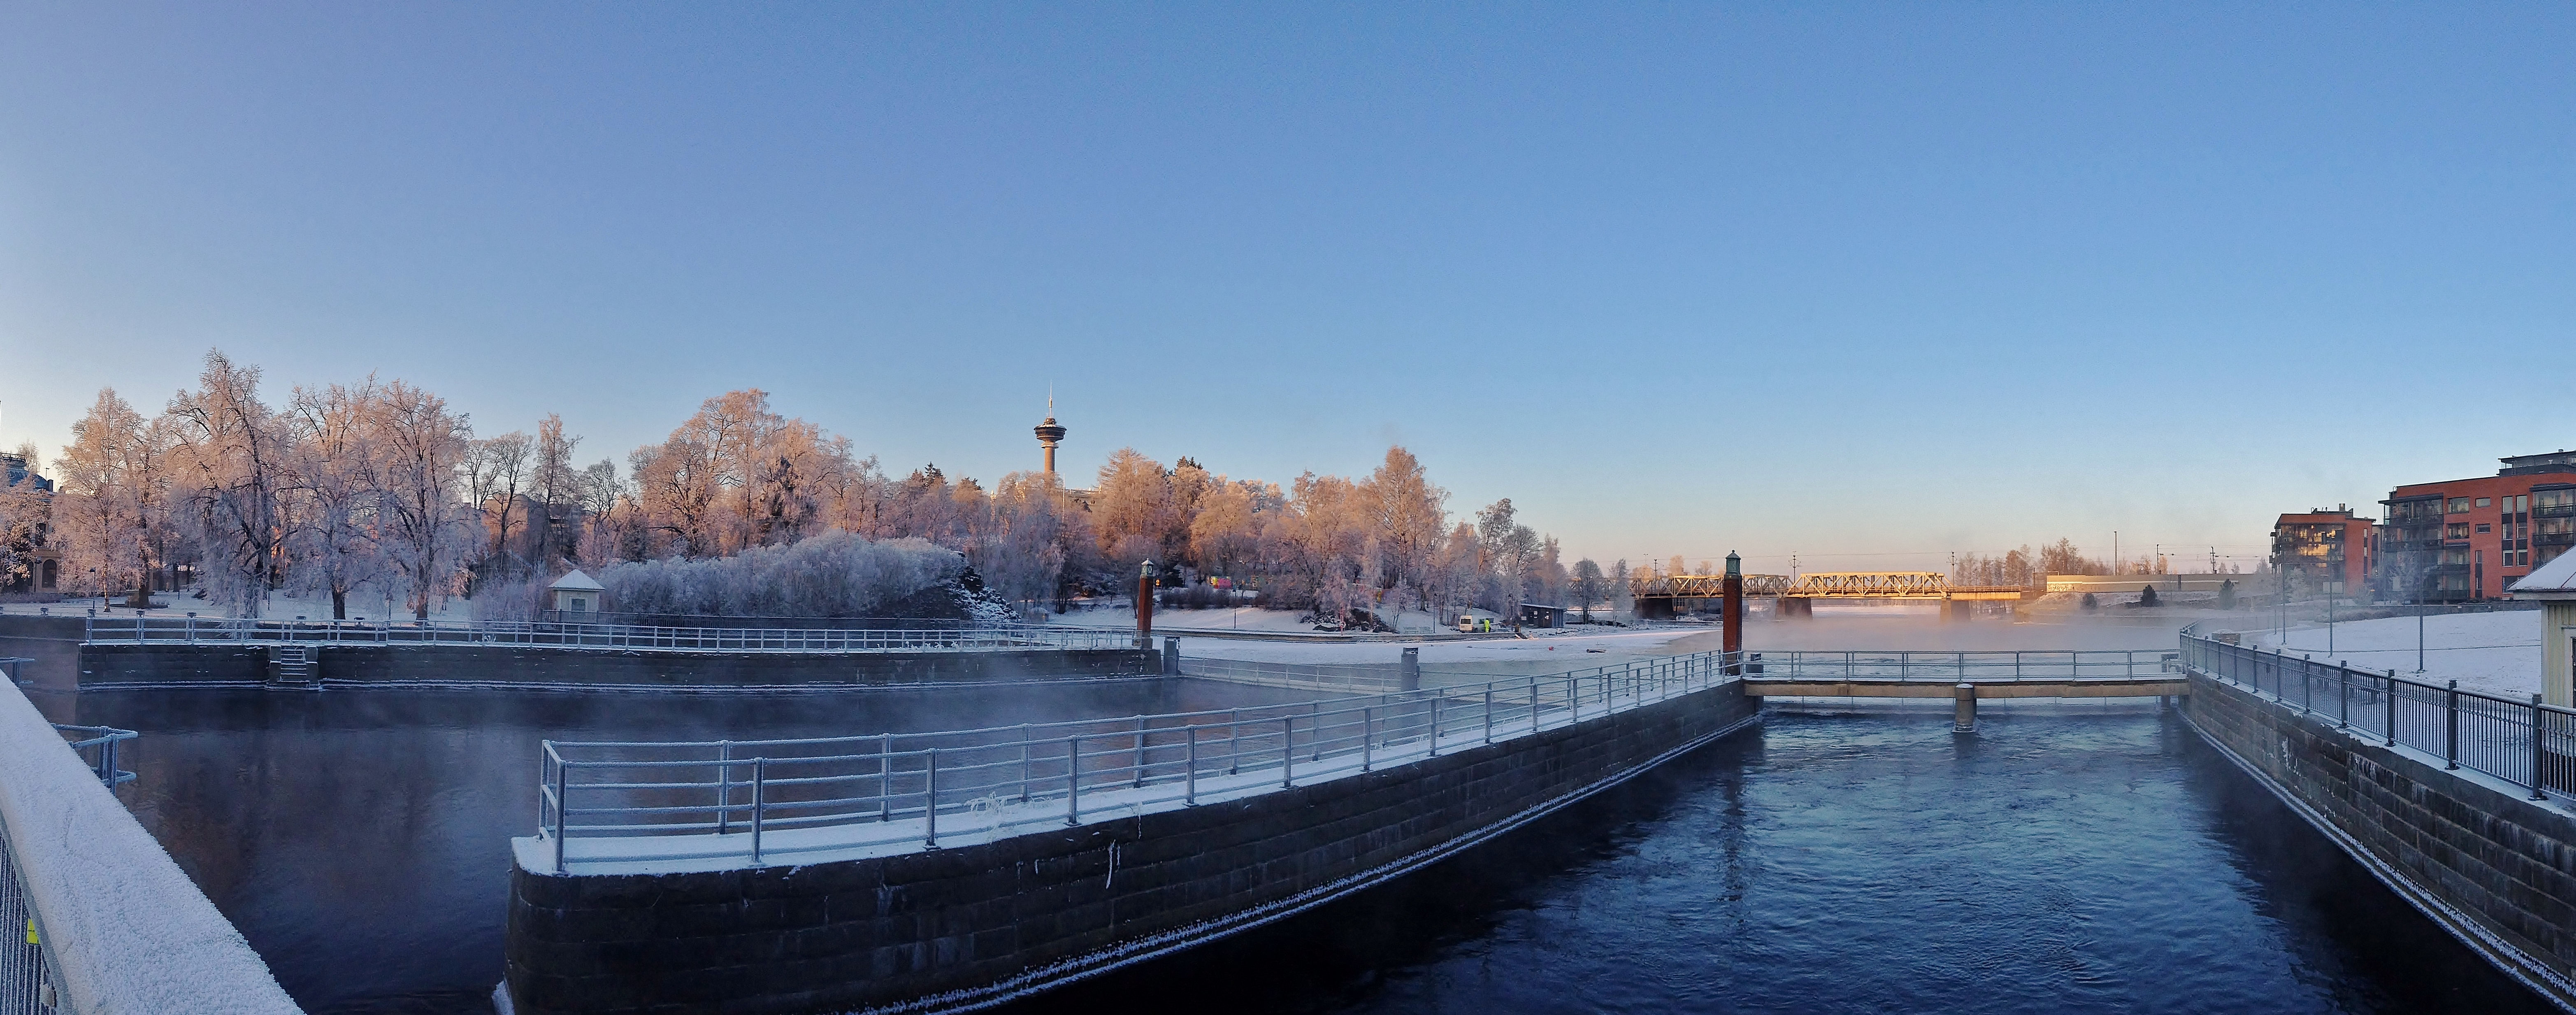 Palatsinraitin Bridge on 7th January 2016 panorama.jpg